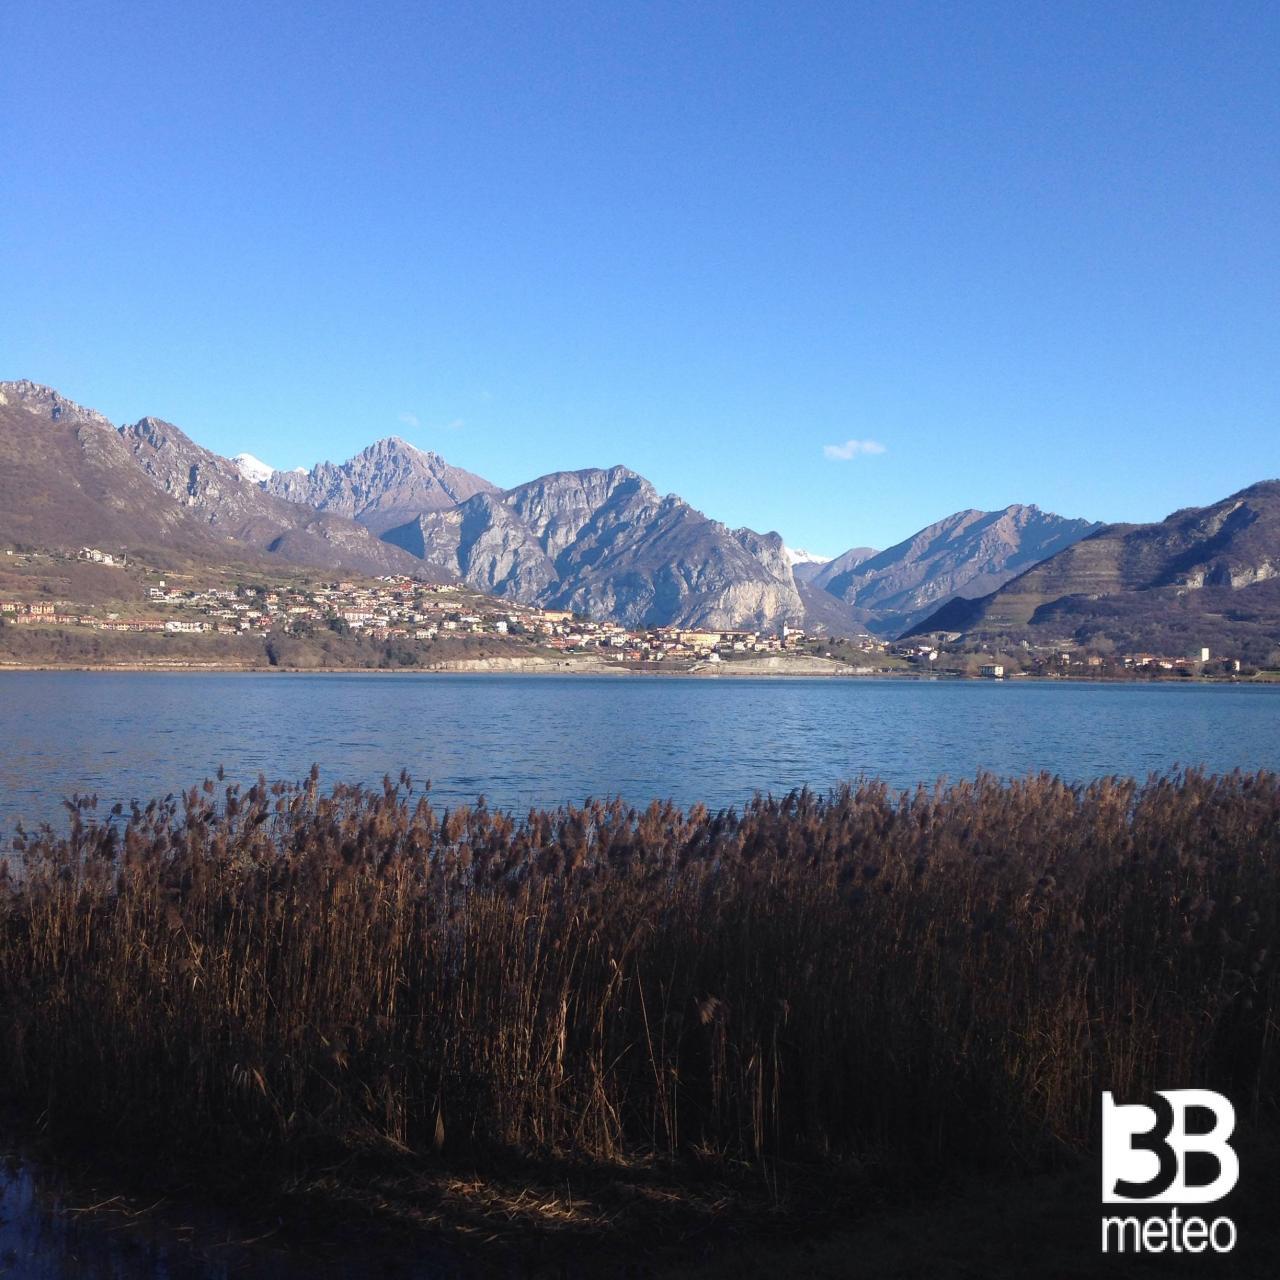 Lago di annone foto gallery 3b meteo - 3b meteo bagno di romagna ...